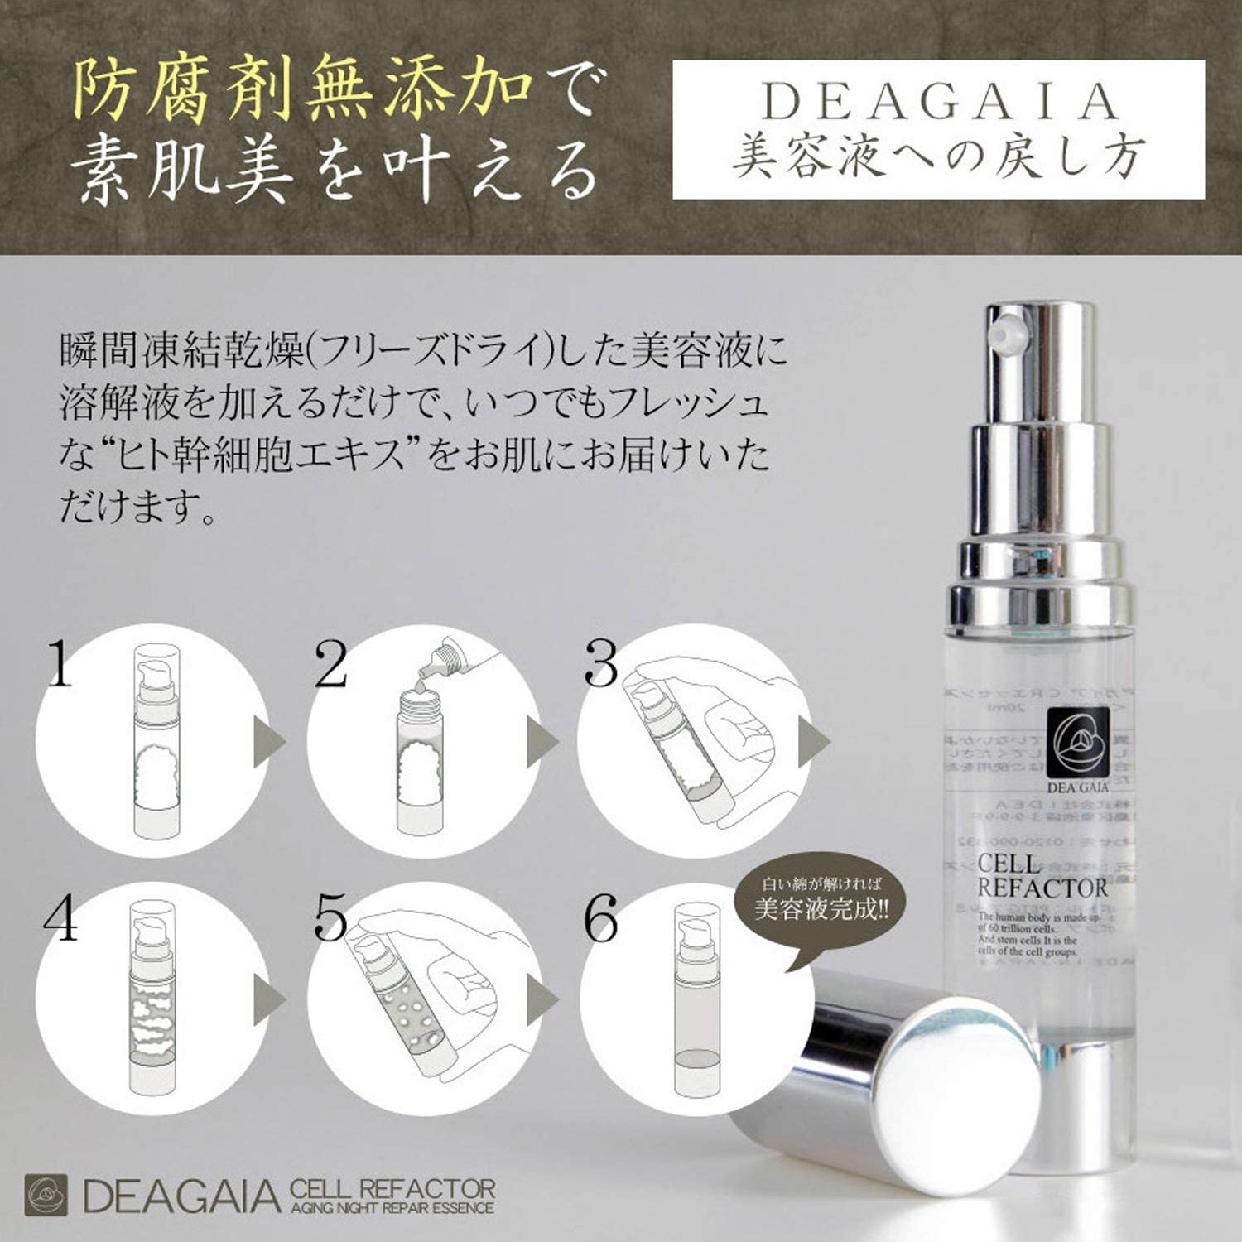 DEAGAIA(ディアガイア) ナイトリペアエッセンスの商品画像5